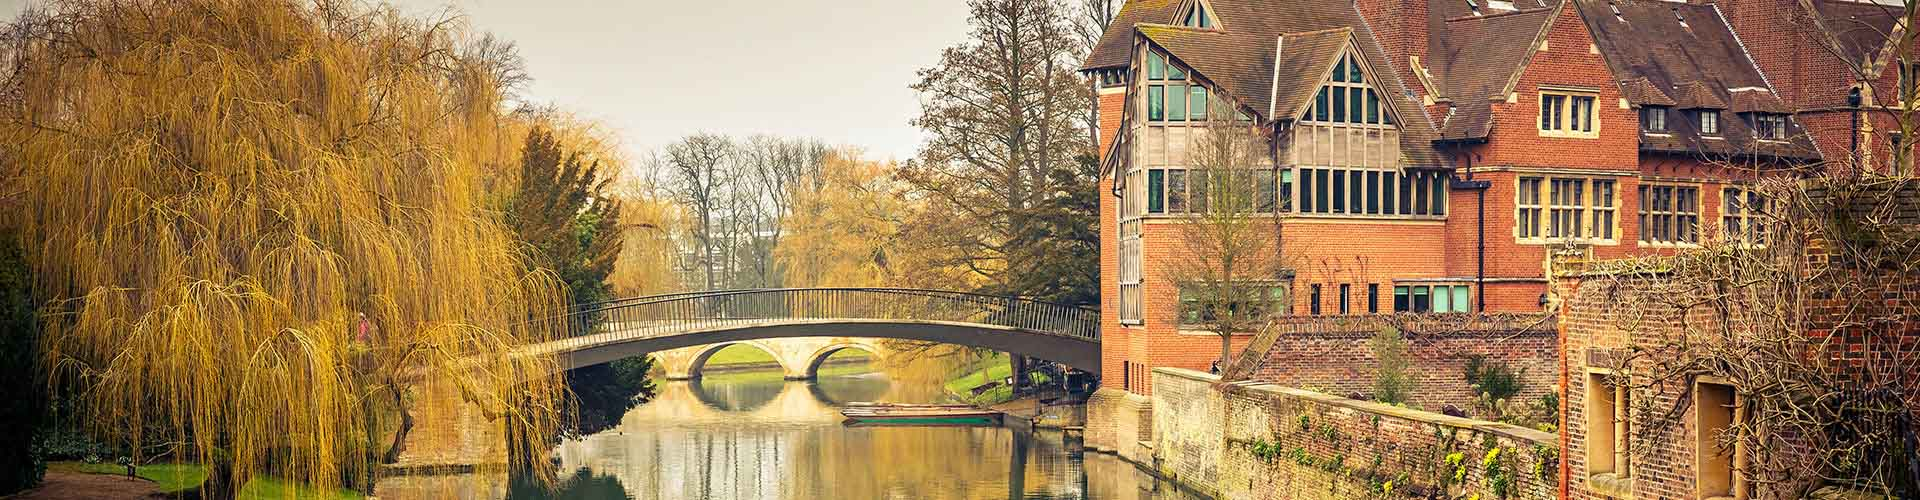 Cambridge - hotely v Cambridge. Mapy pro Cambridge, fotky a recenze pro každý hotel - Cambridge.